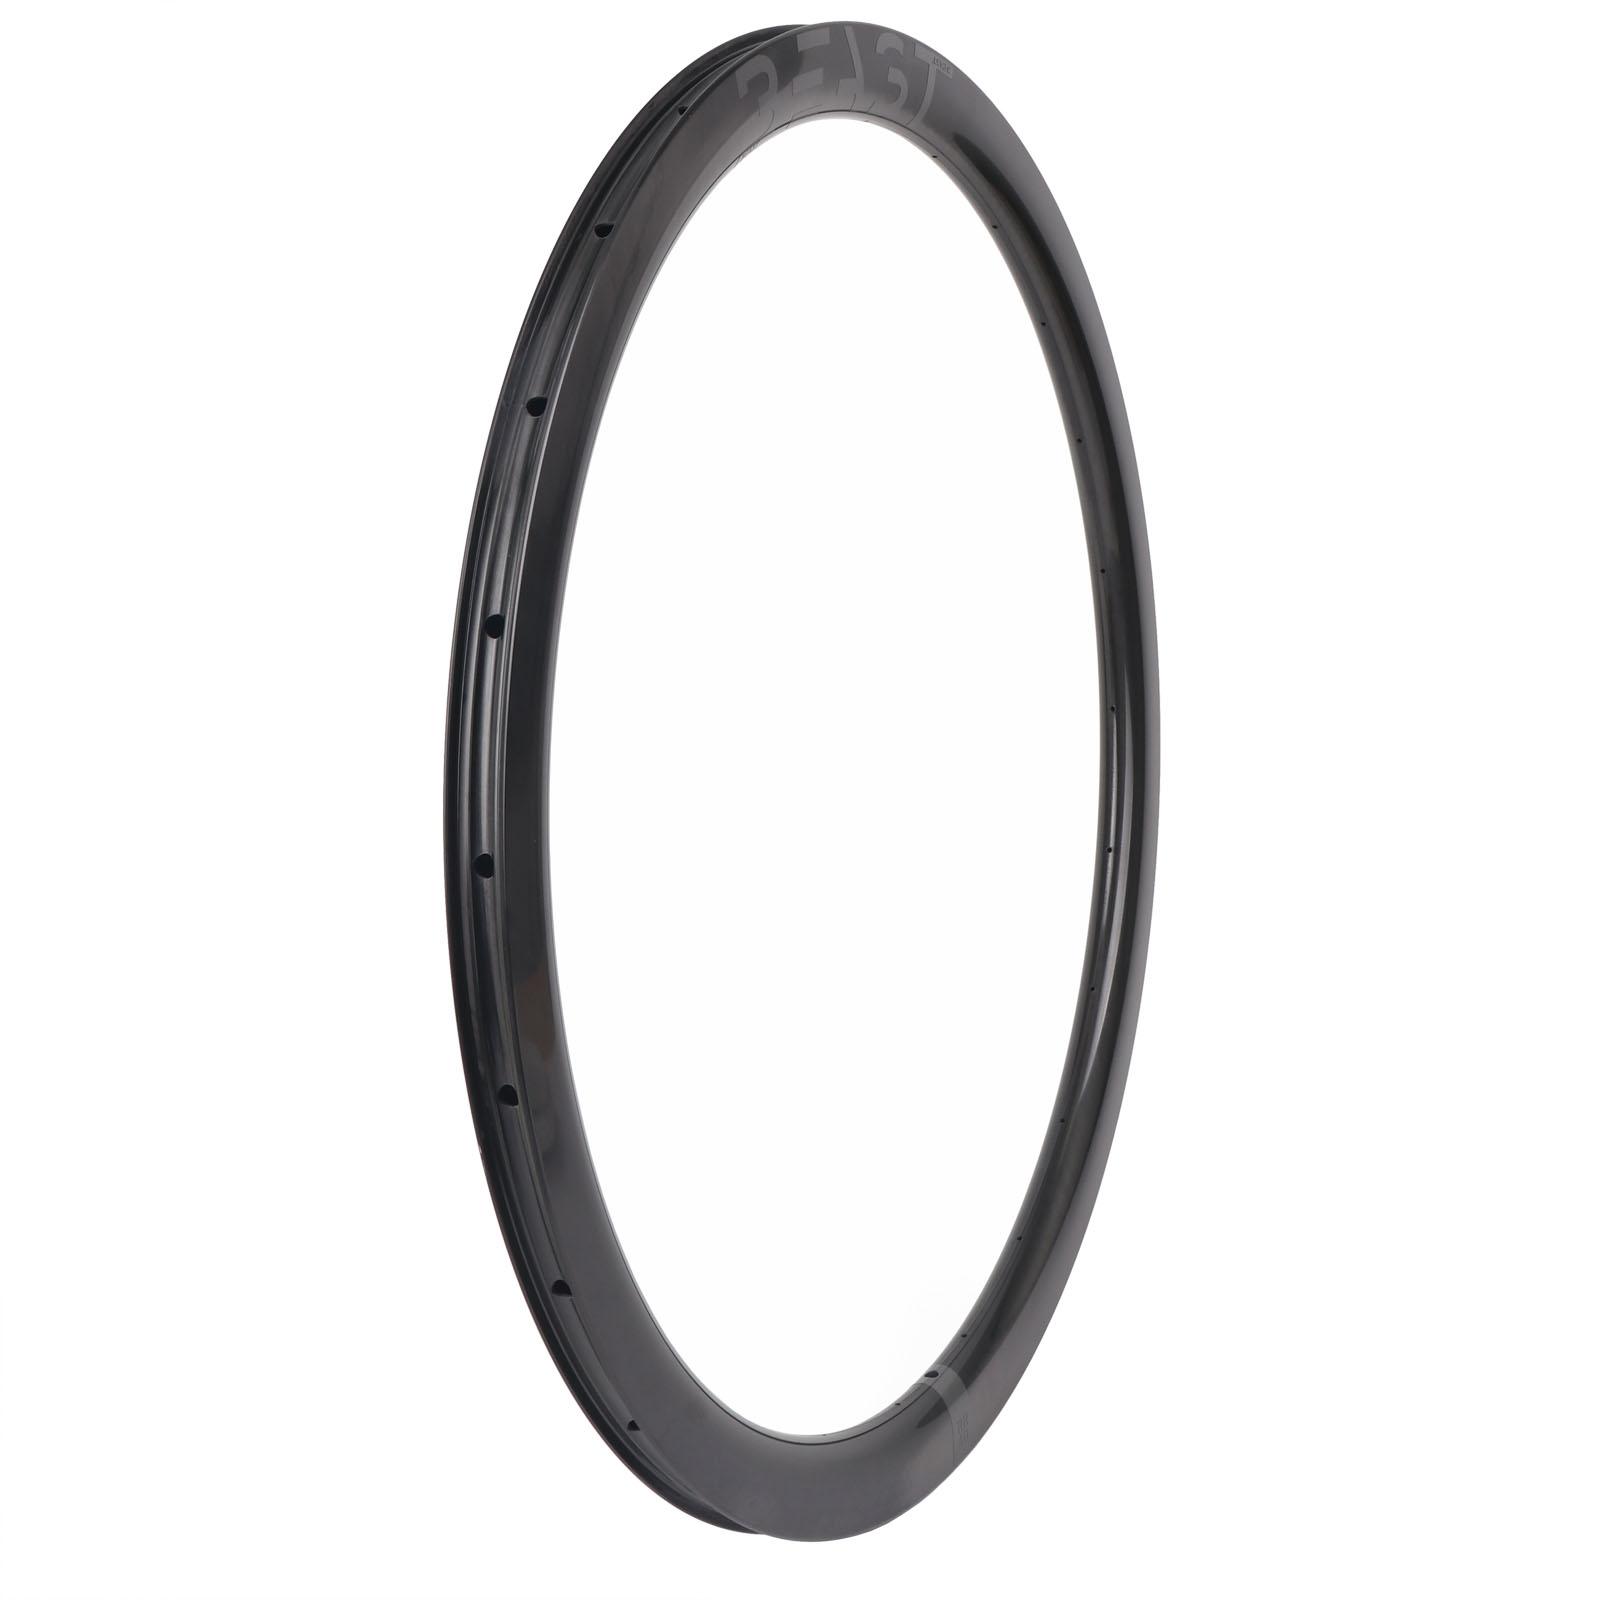 Image of Beast Components RR40 Carbon Disc Clincher Rim - 20-622 - 24 Hole - UD black